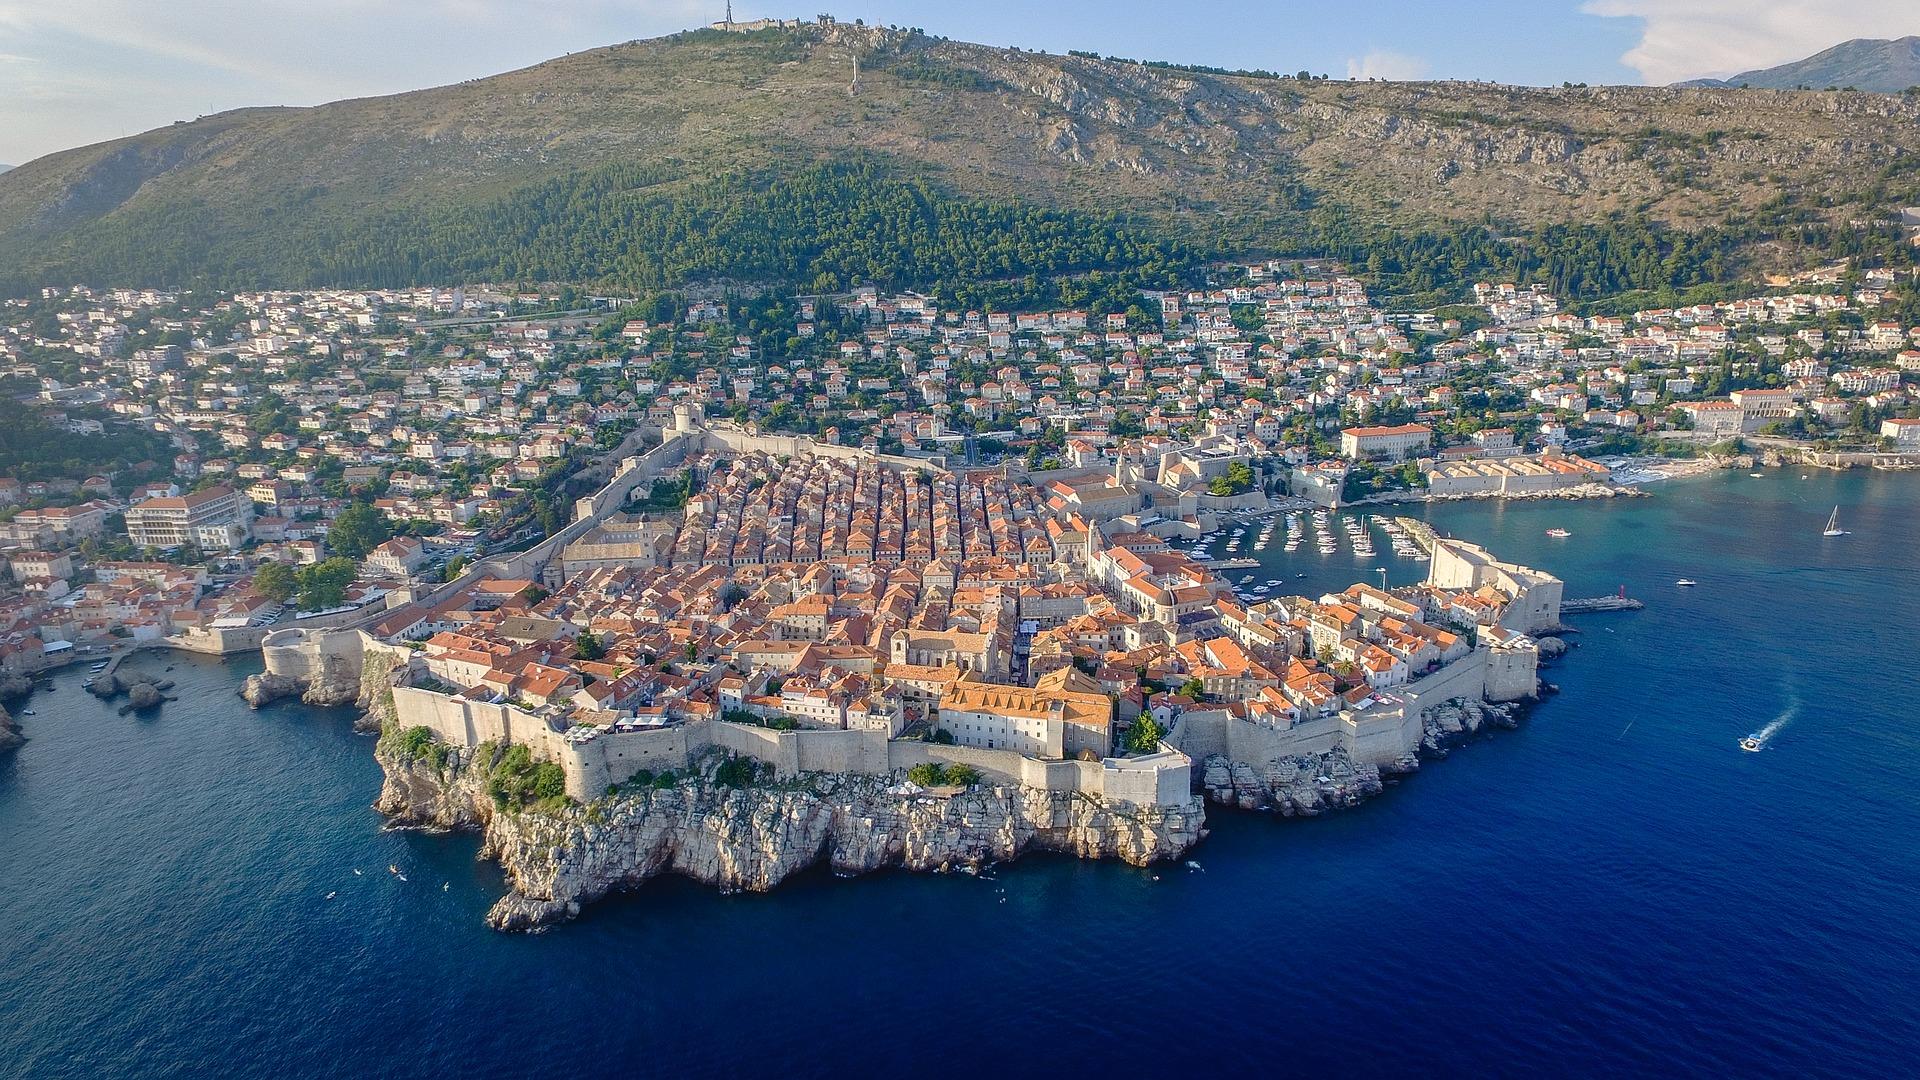 Old Town - Dubrovnik